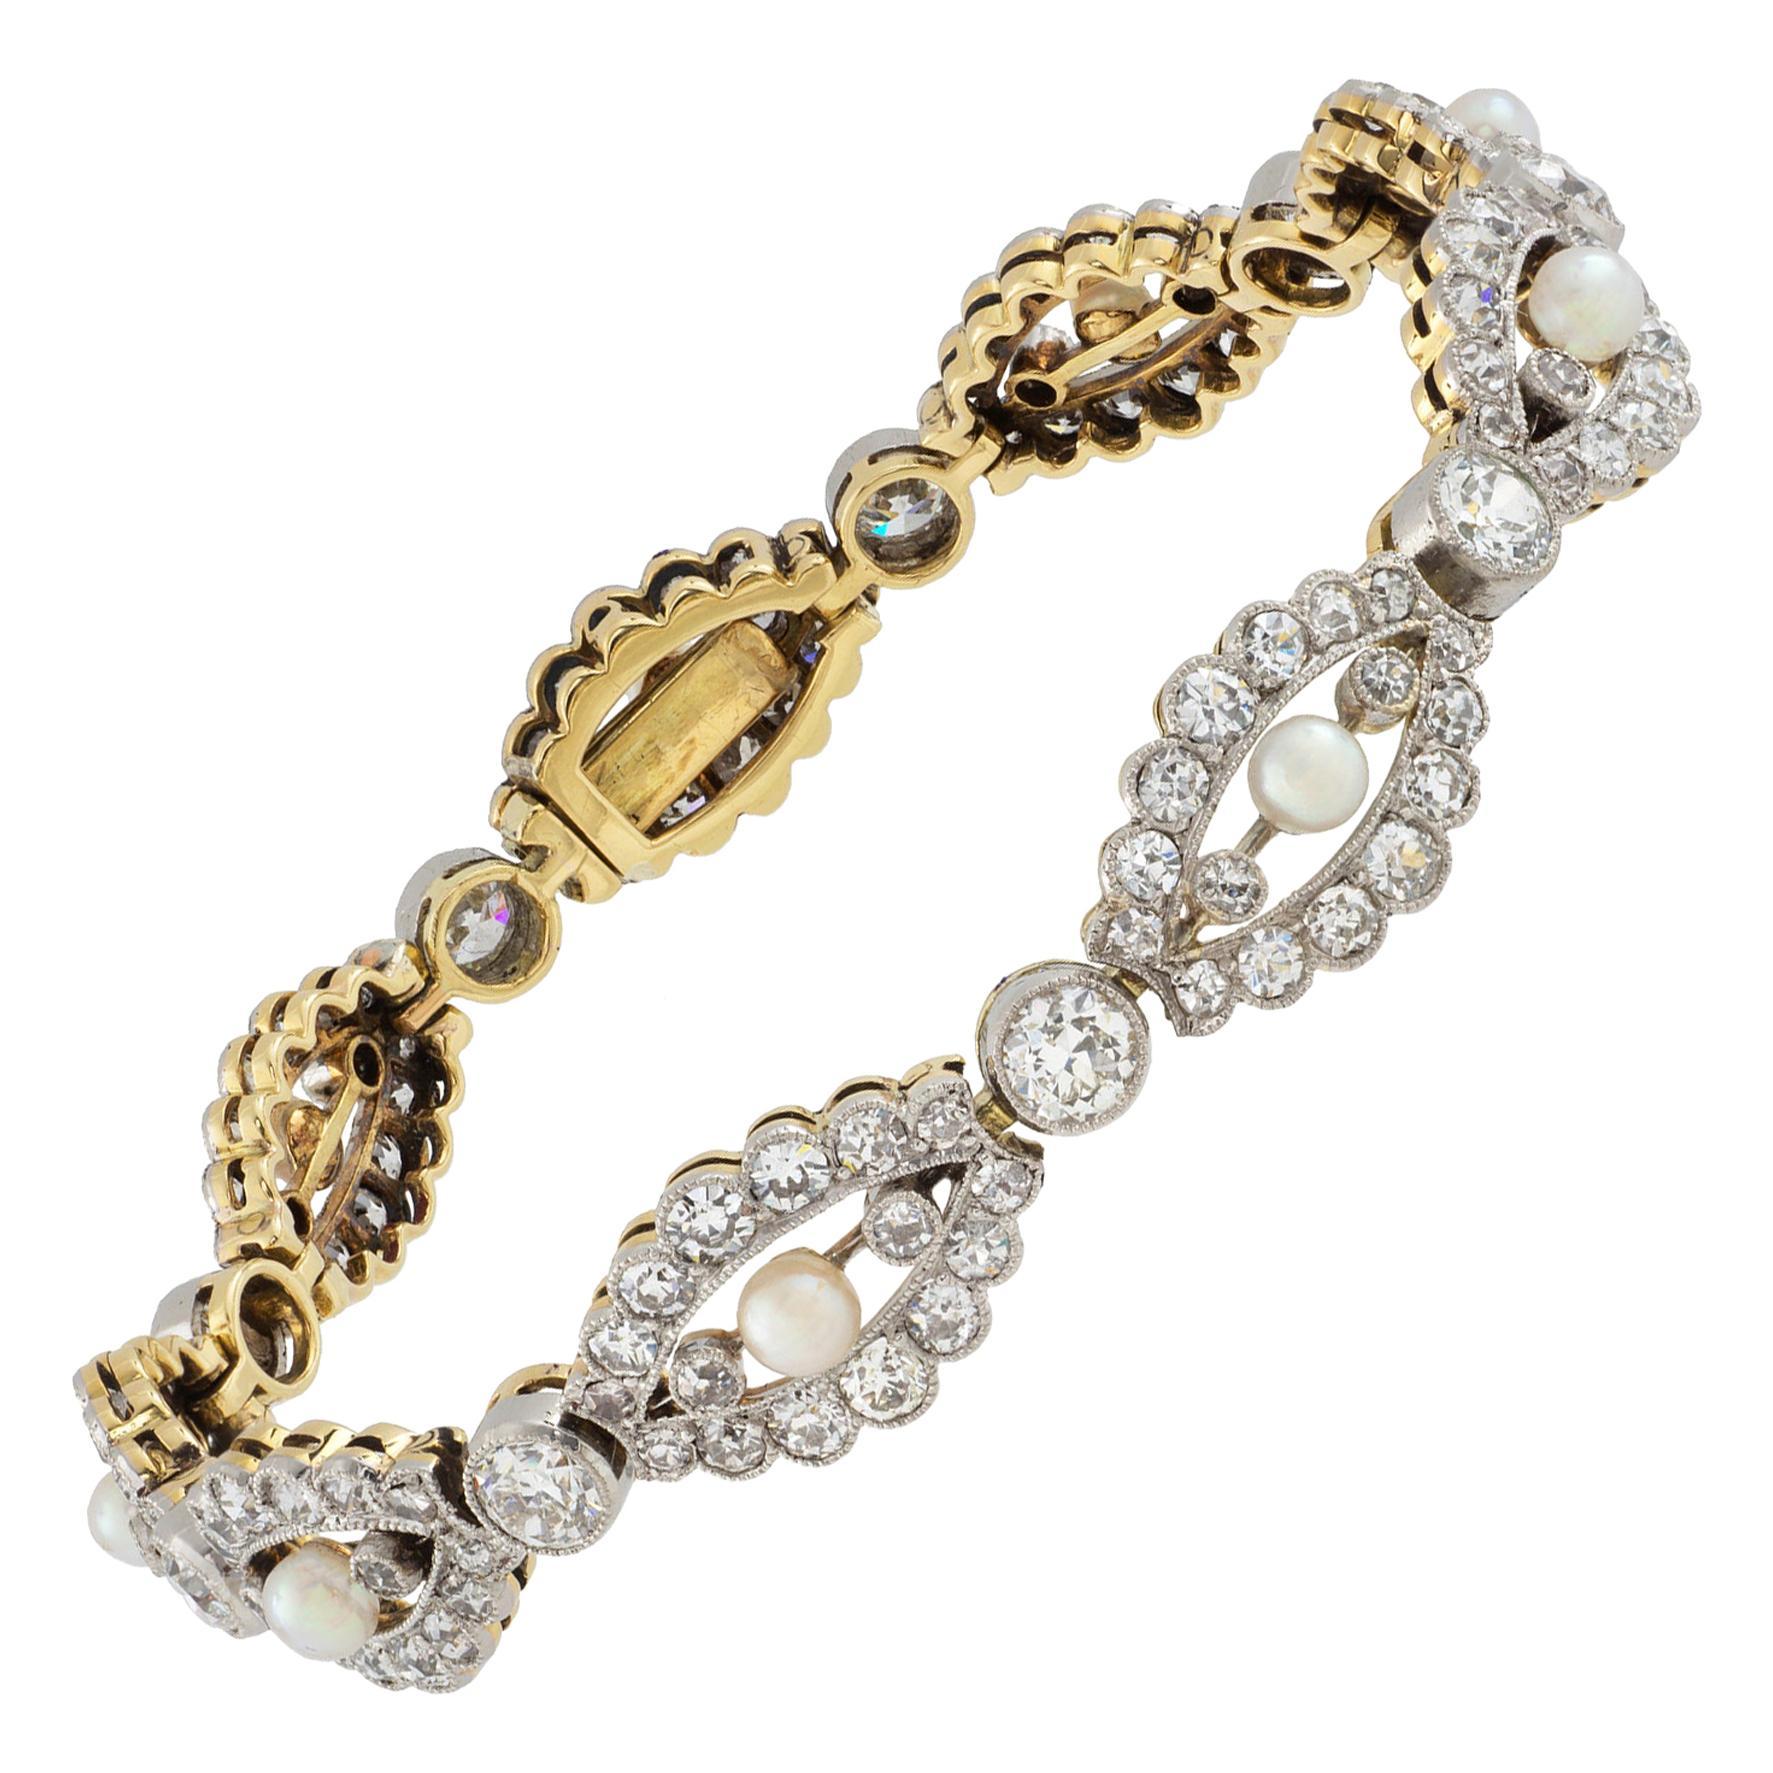 Edwardian Pearl and Diamond Bracelet